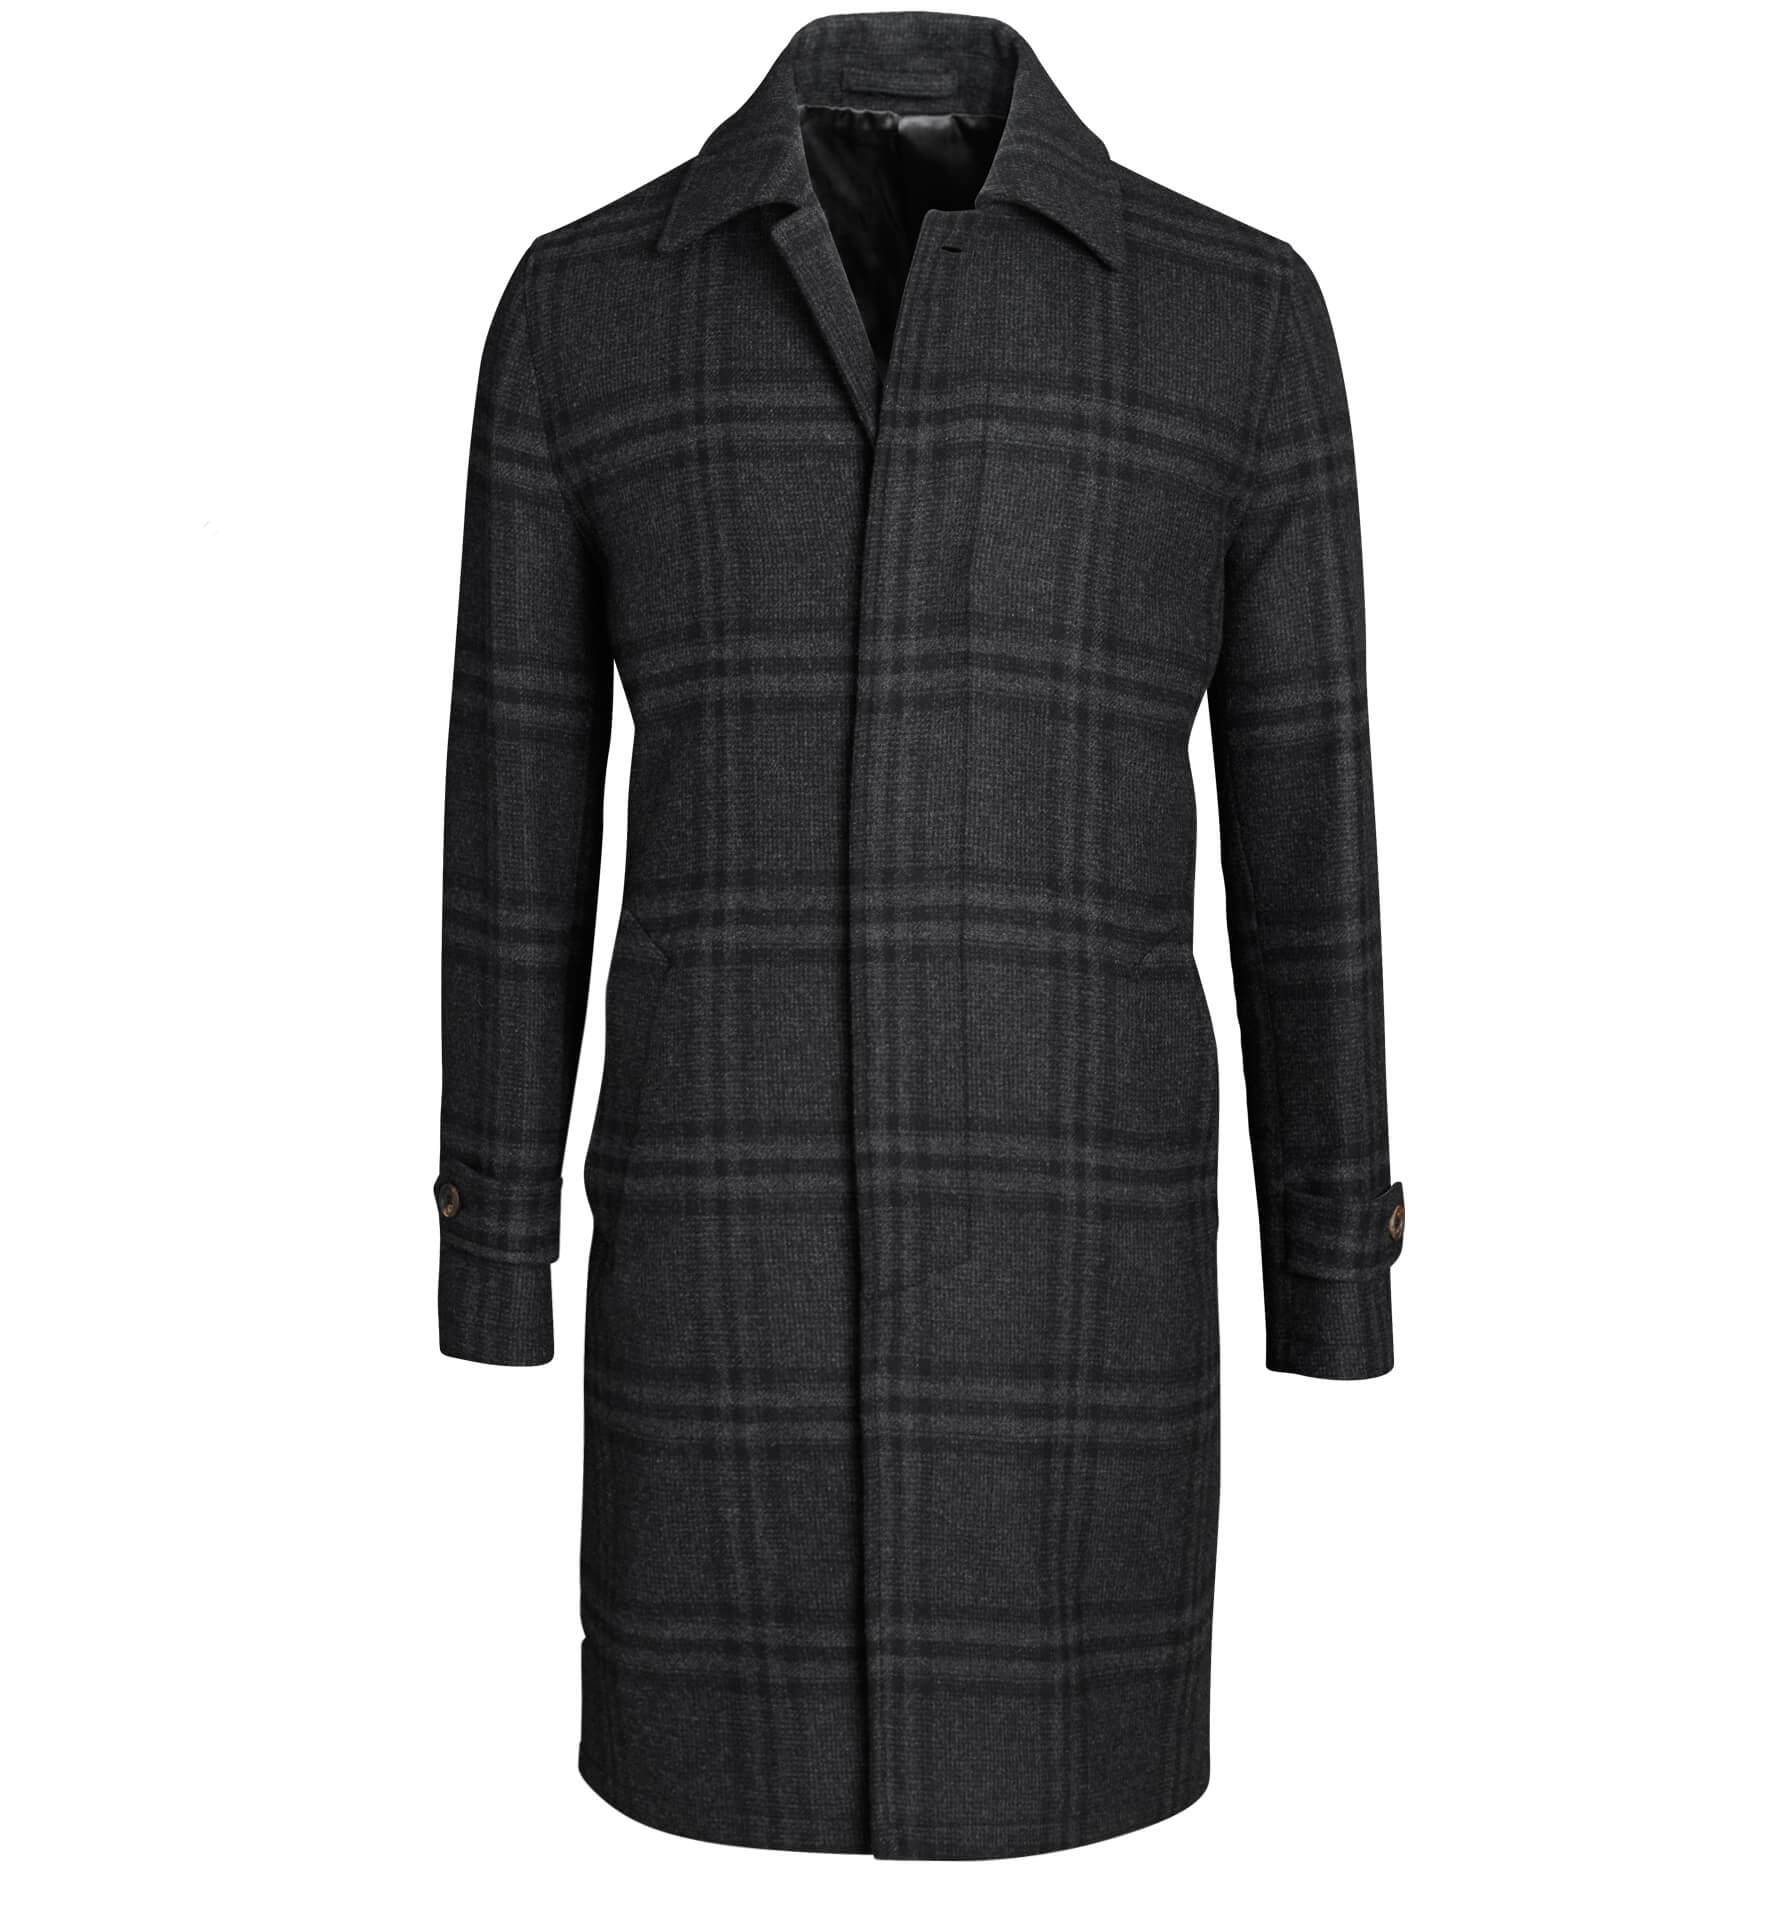 Zoom Image of Lazio Charcoal Plaid Wool Coat